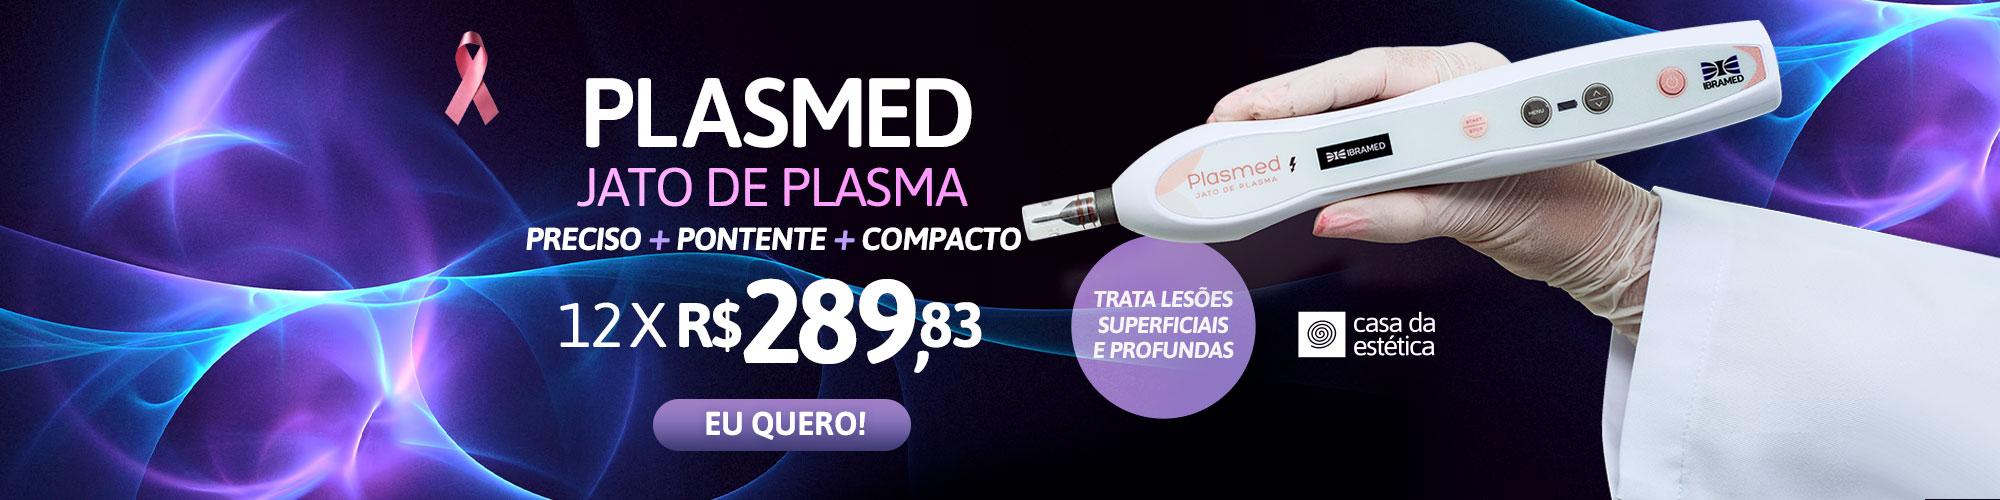 Plasmed